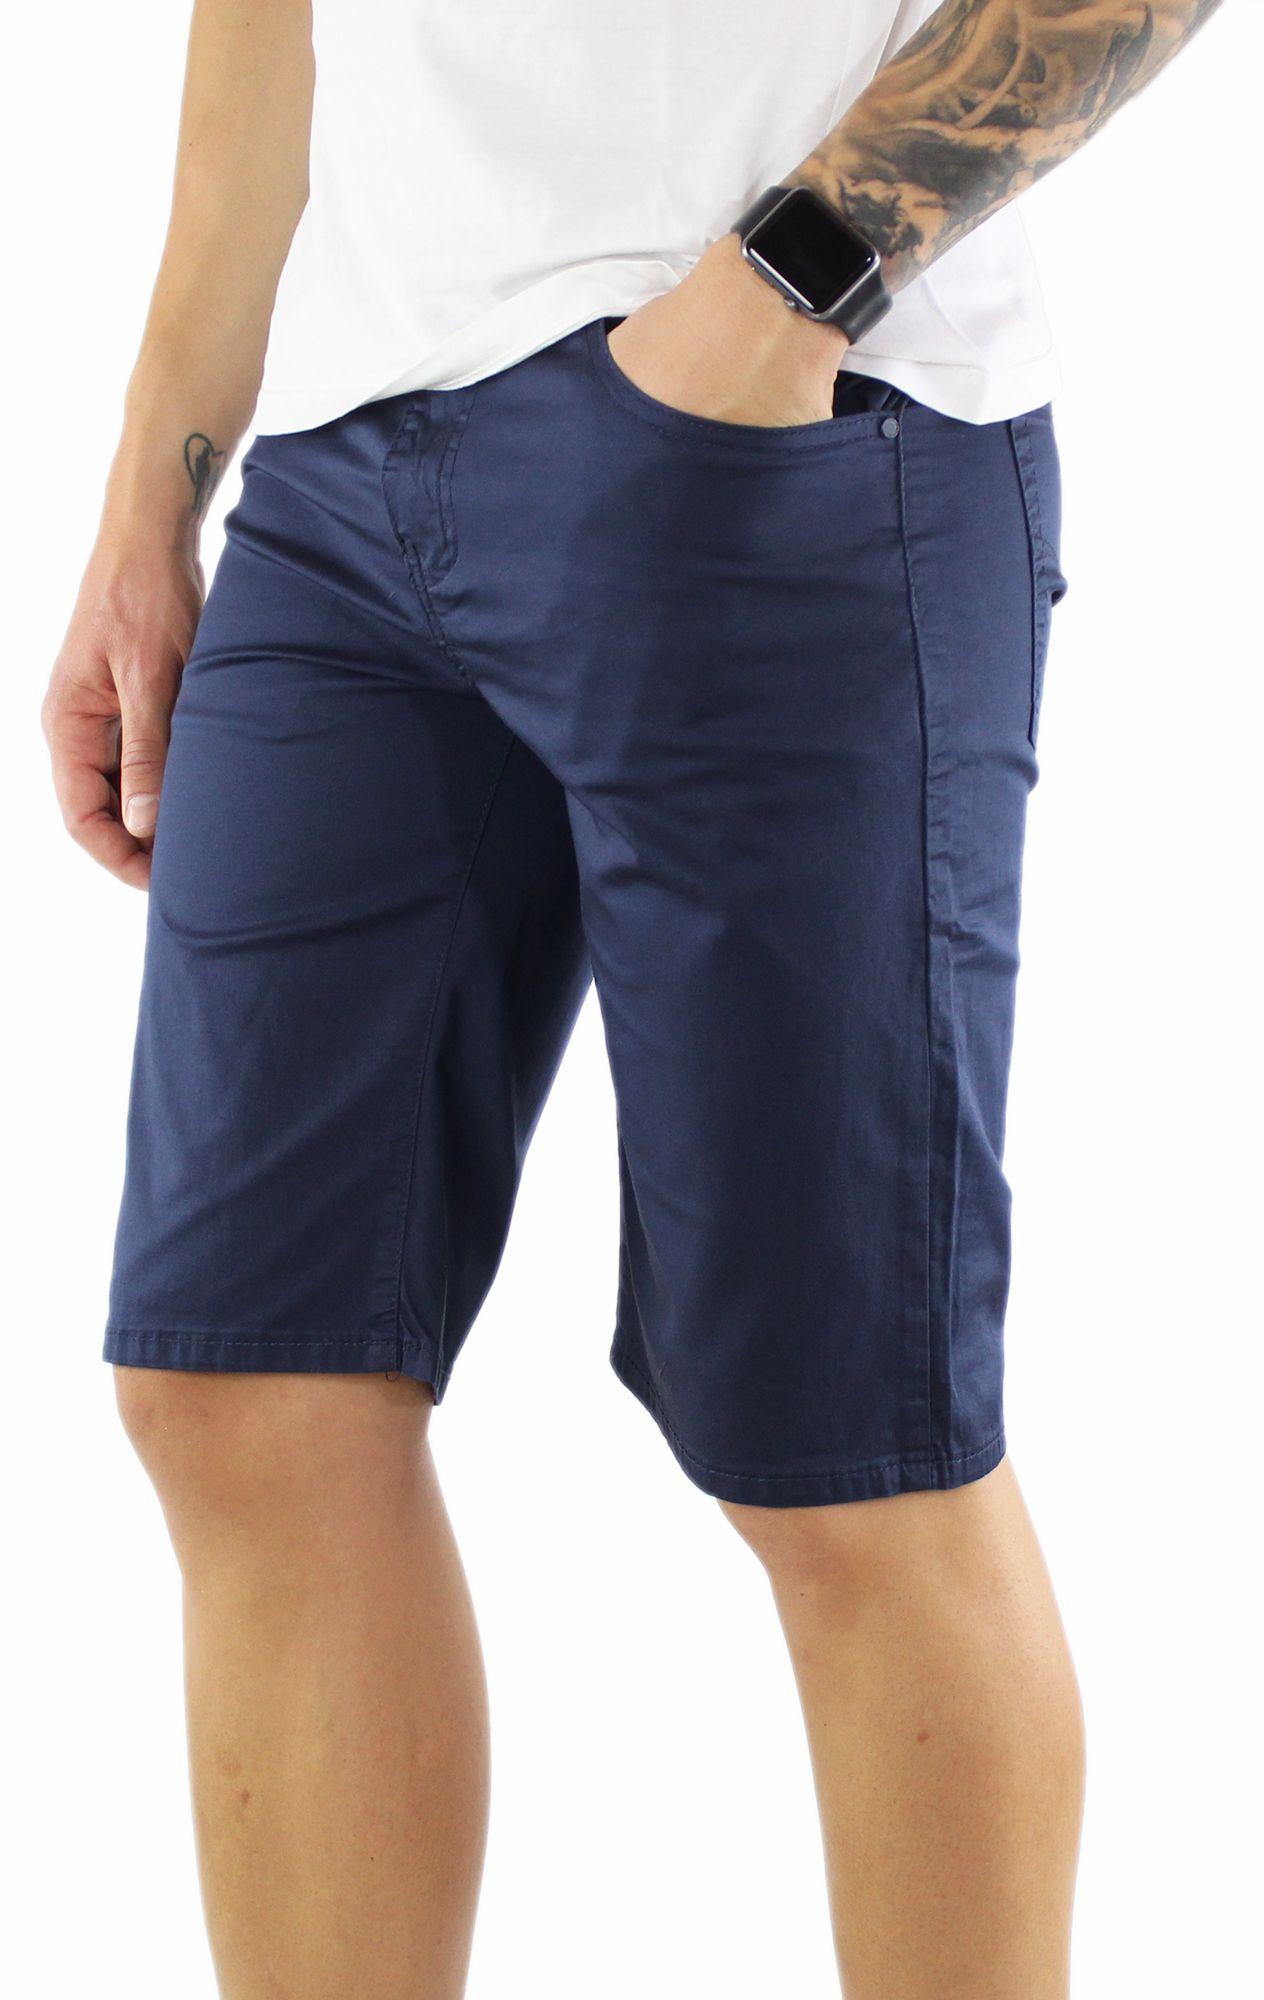 Bermuda-Uomo-Cotone-Slim-Fit-Pantalone-Corto-Shorts-Pantaloncini-Casual miniatuur 12